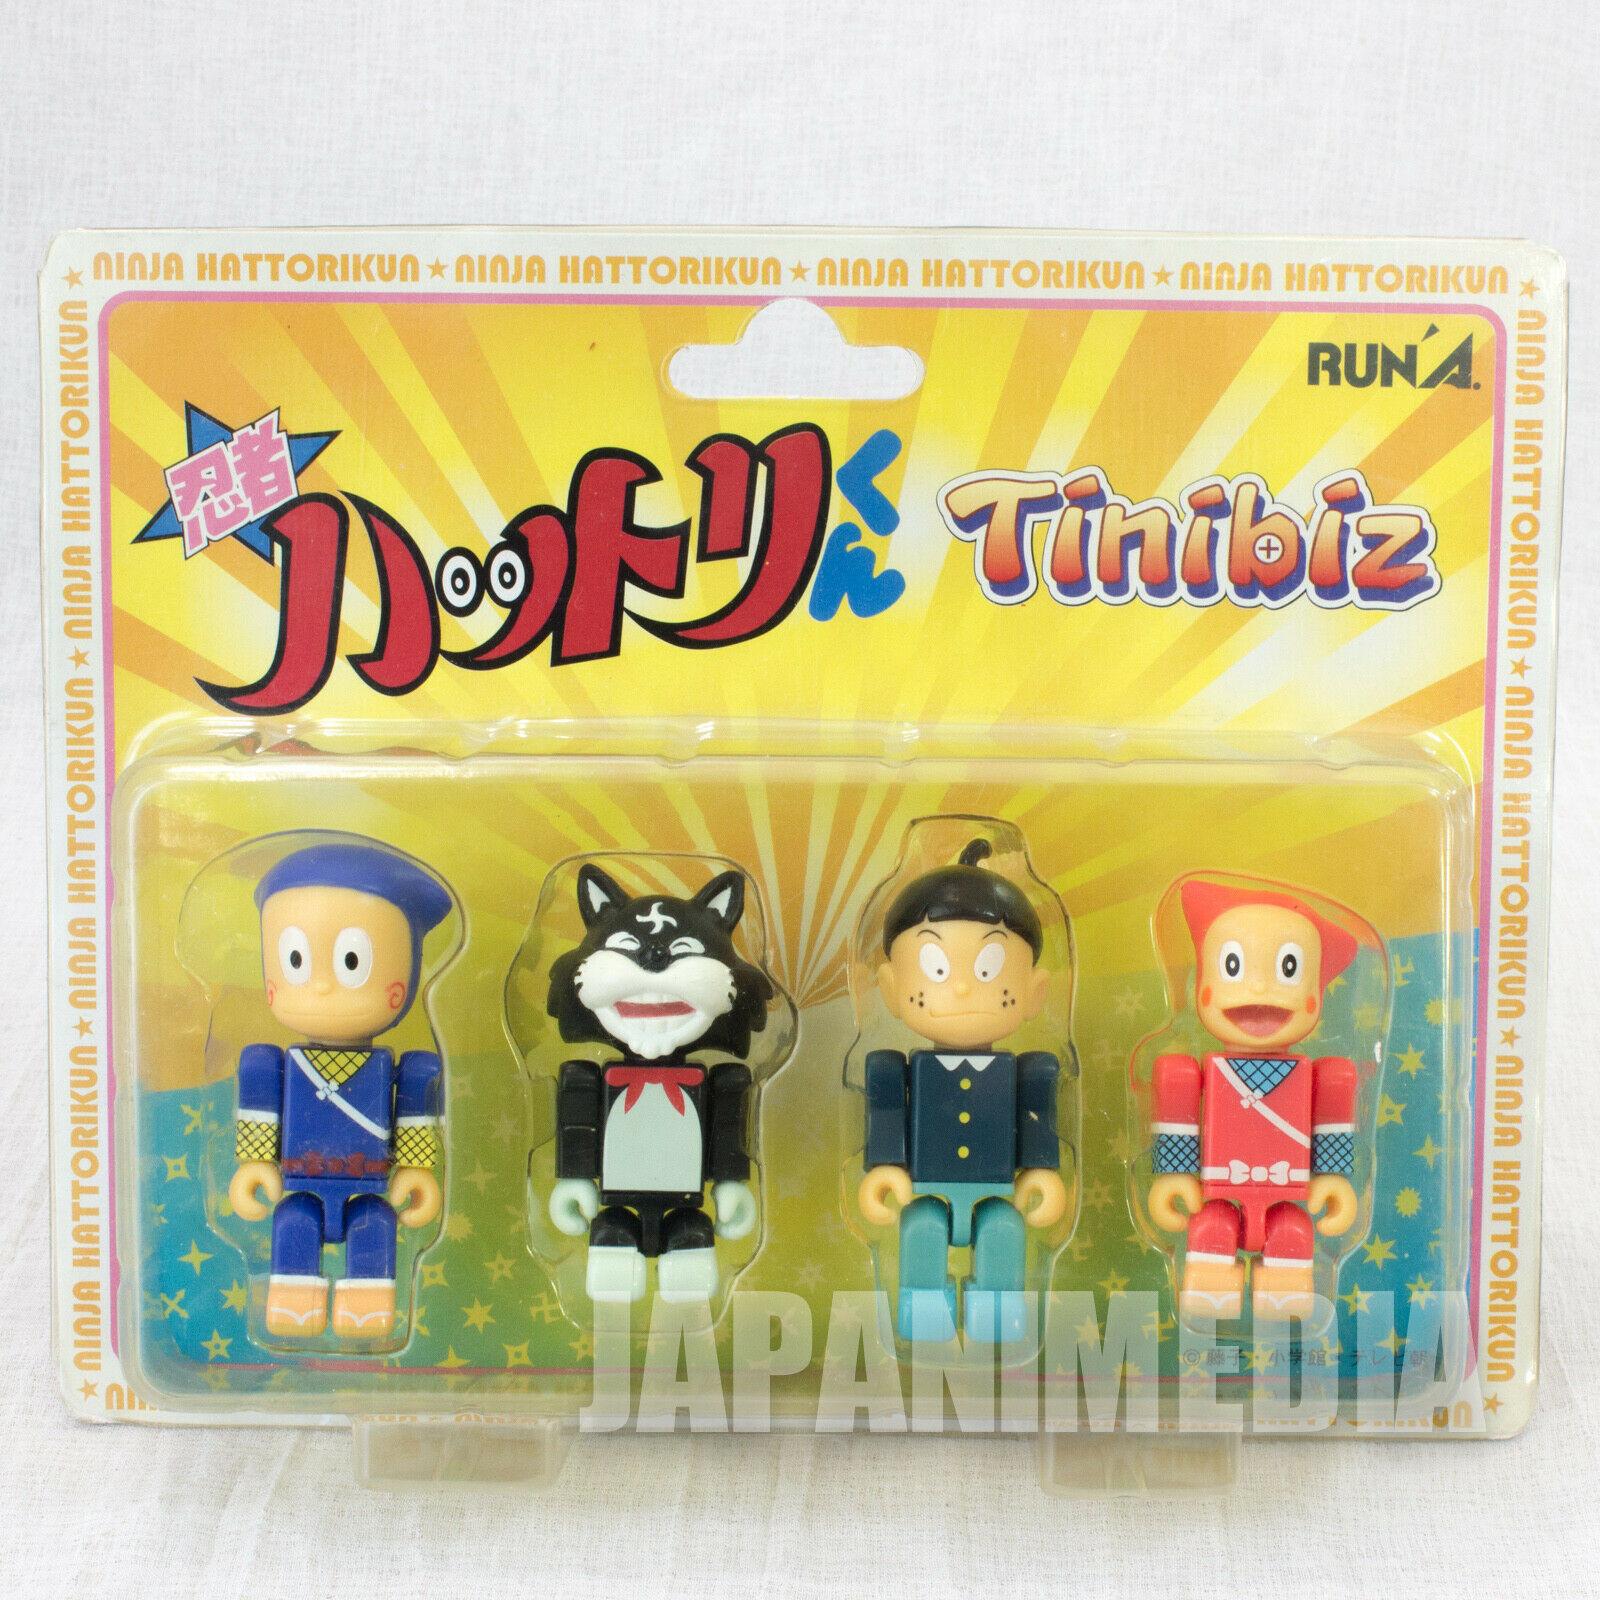 Ninja Hattori-kun Tinibiz Mini Figure 4pc Set [Hattori / Shinzo / Kemumaki / Kagetiyo] FUJIKO FUJIO